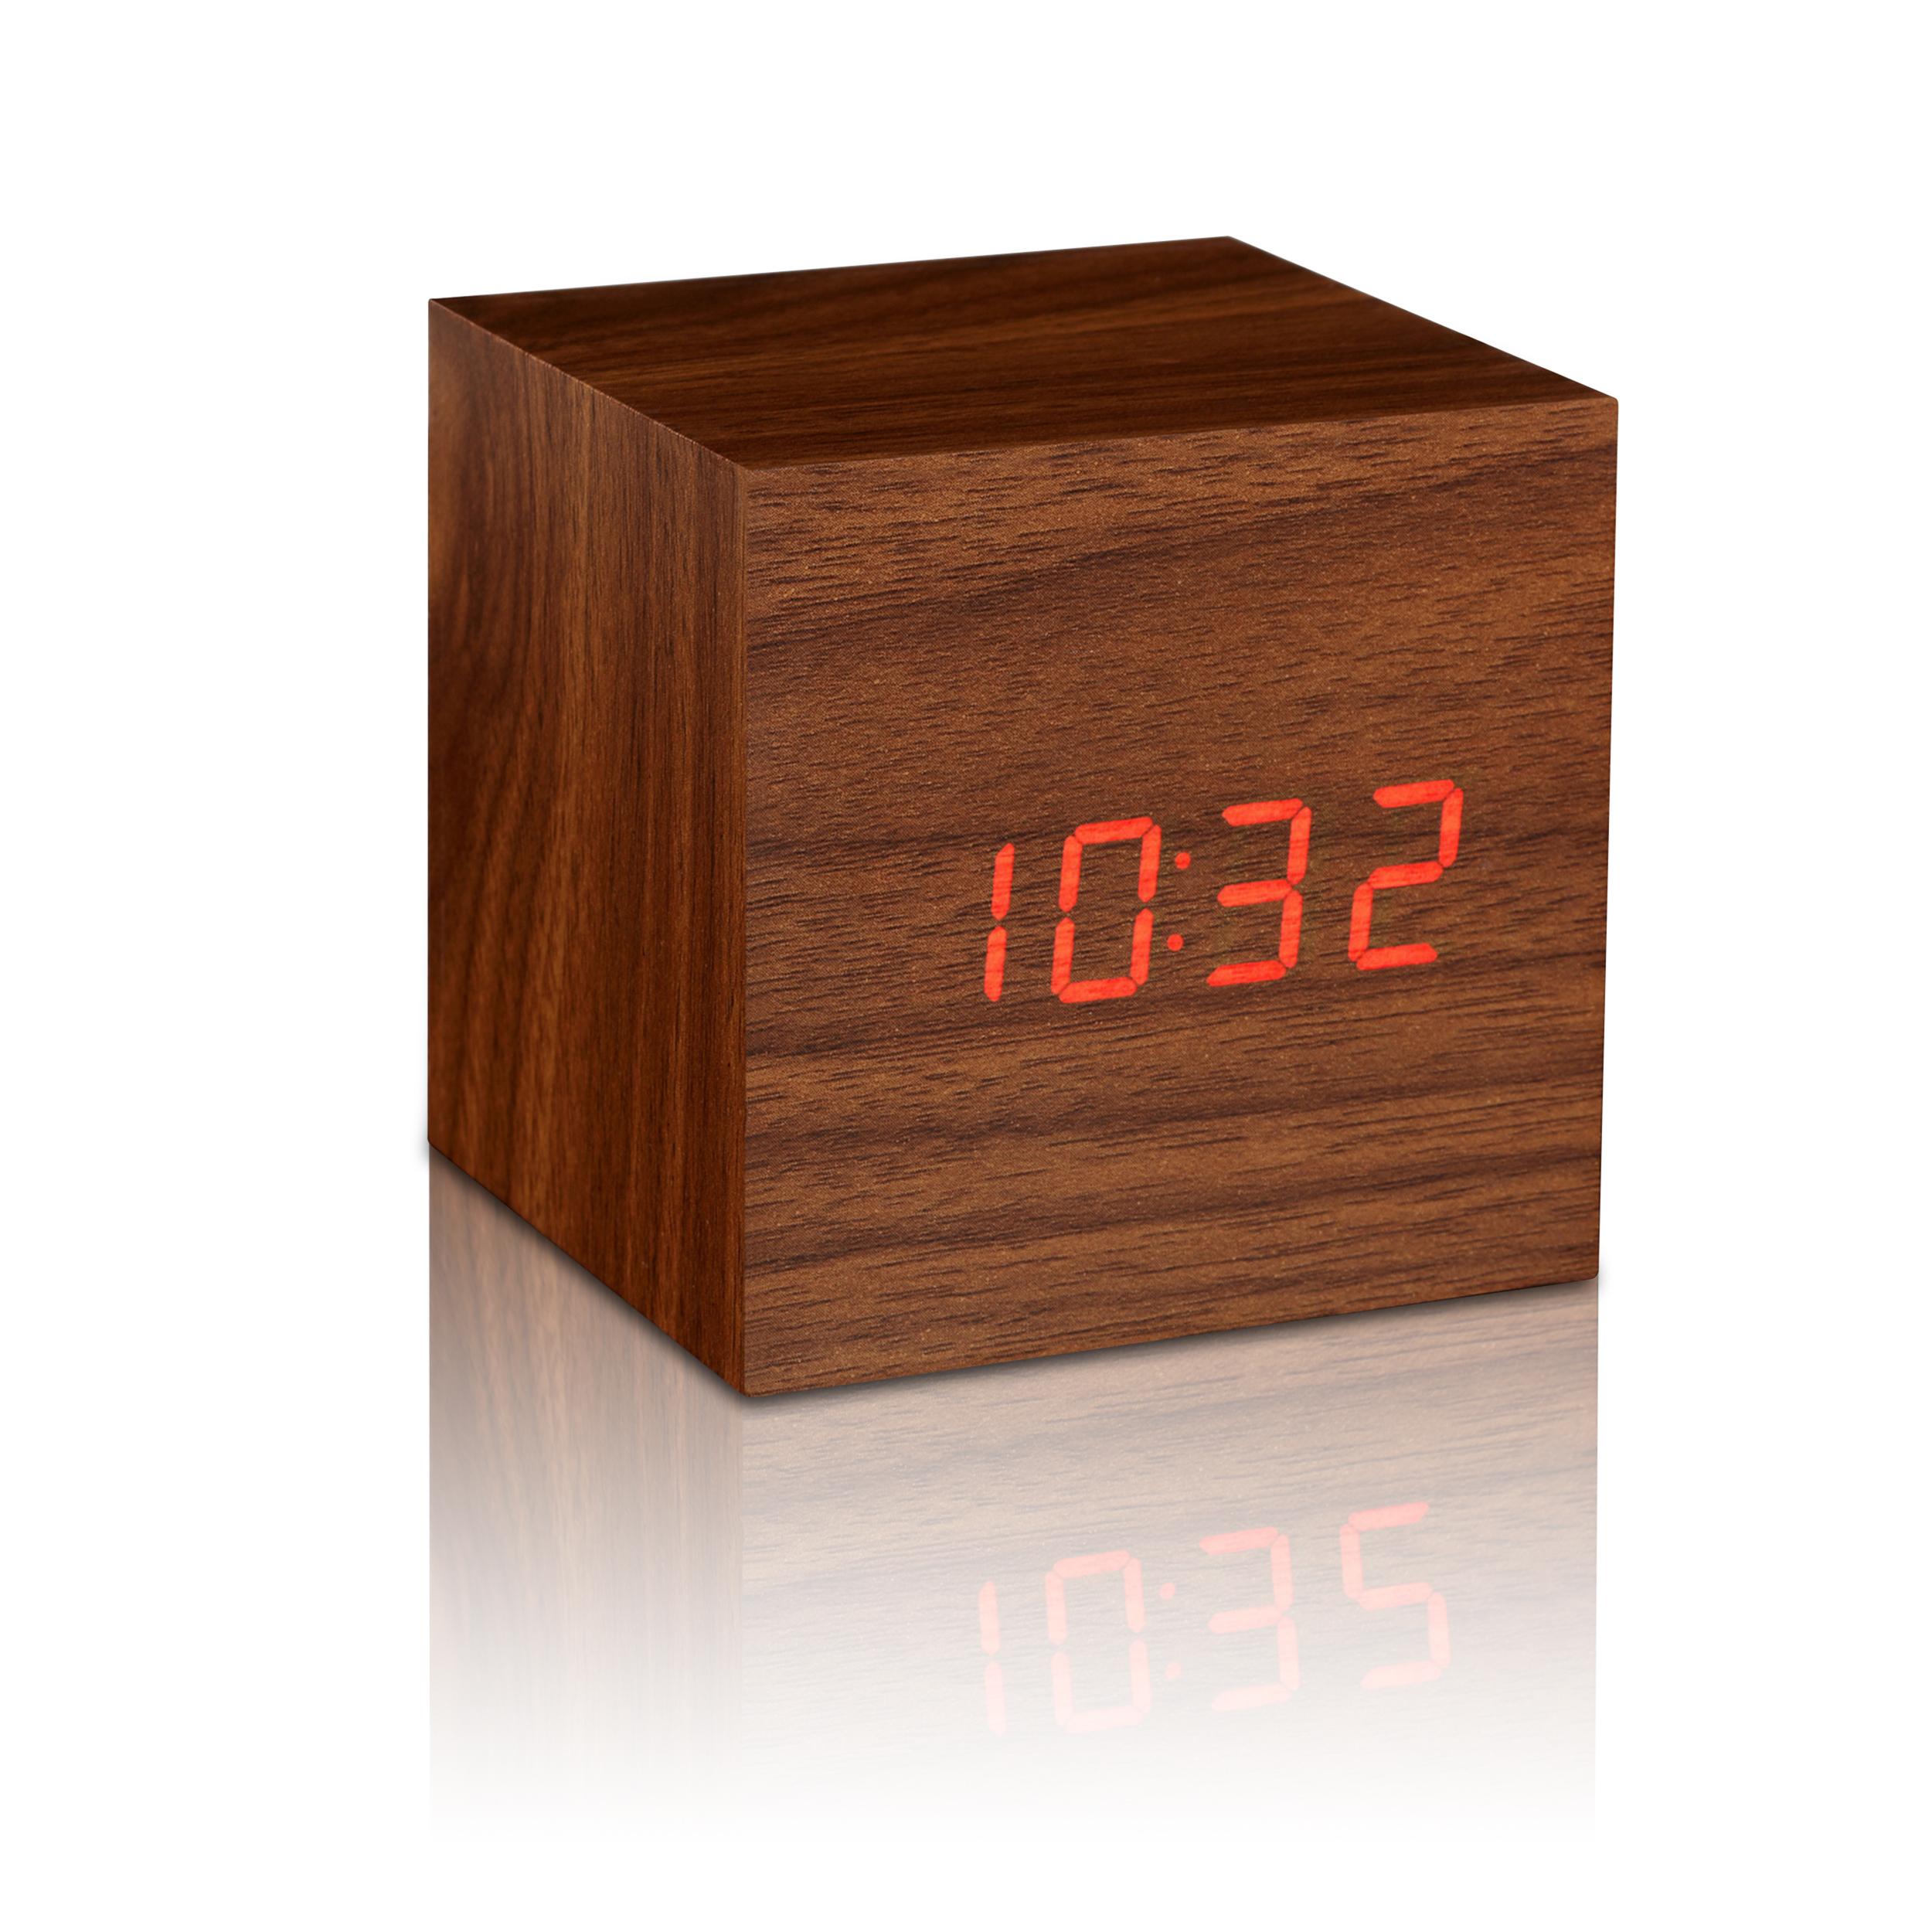 Ceas inteligent Cube Click Clock Walnut/Red